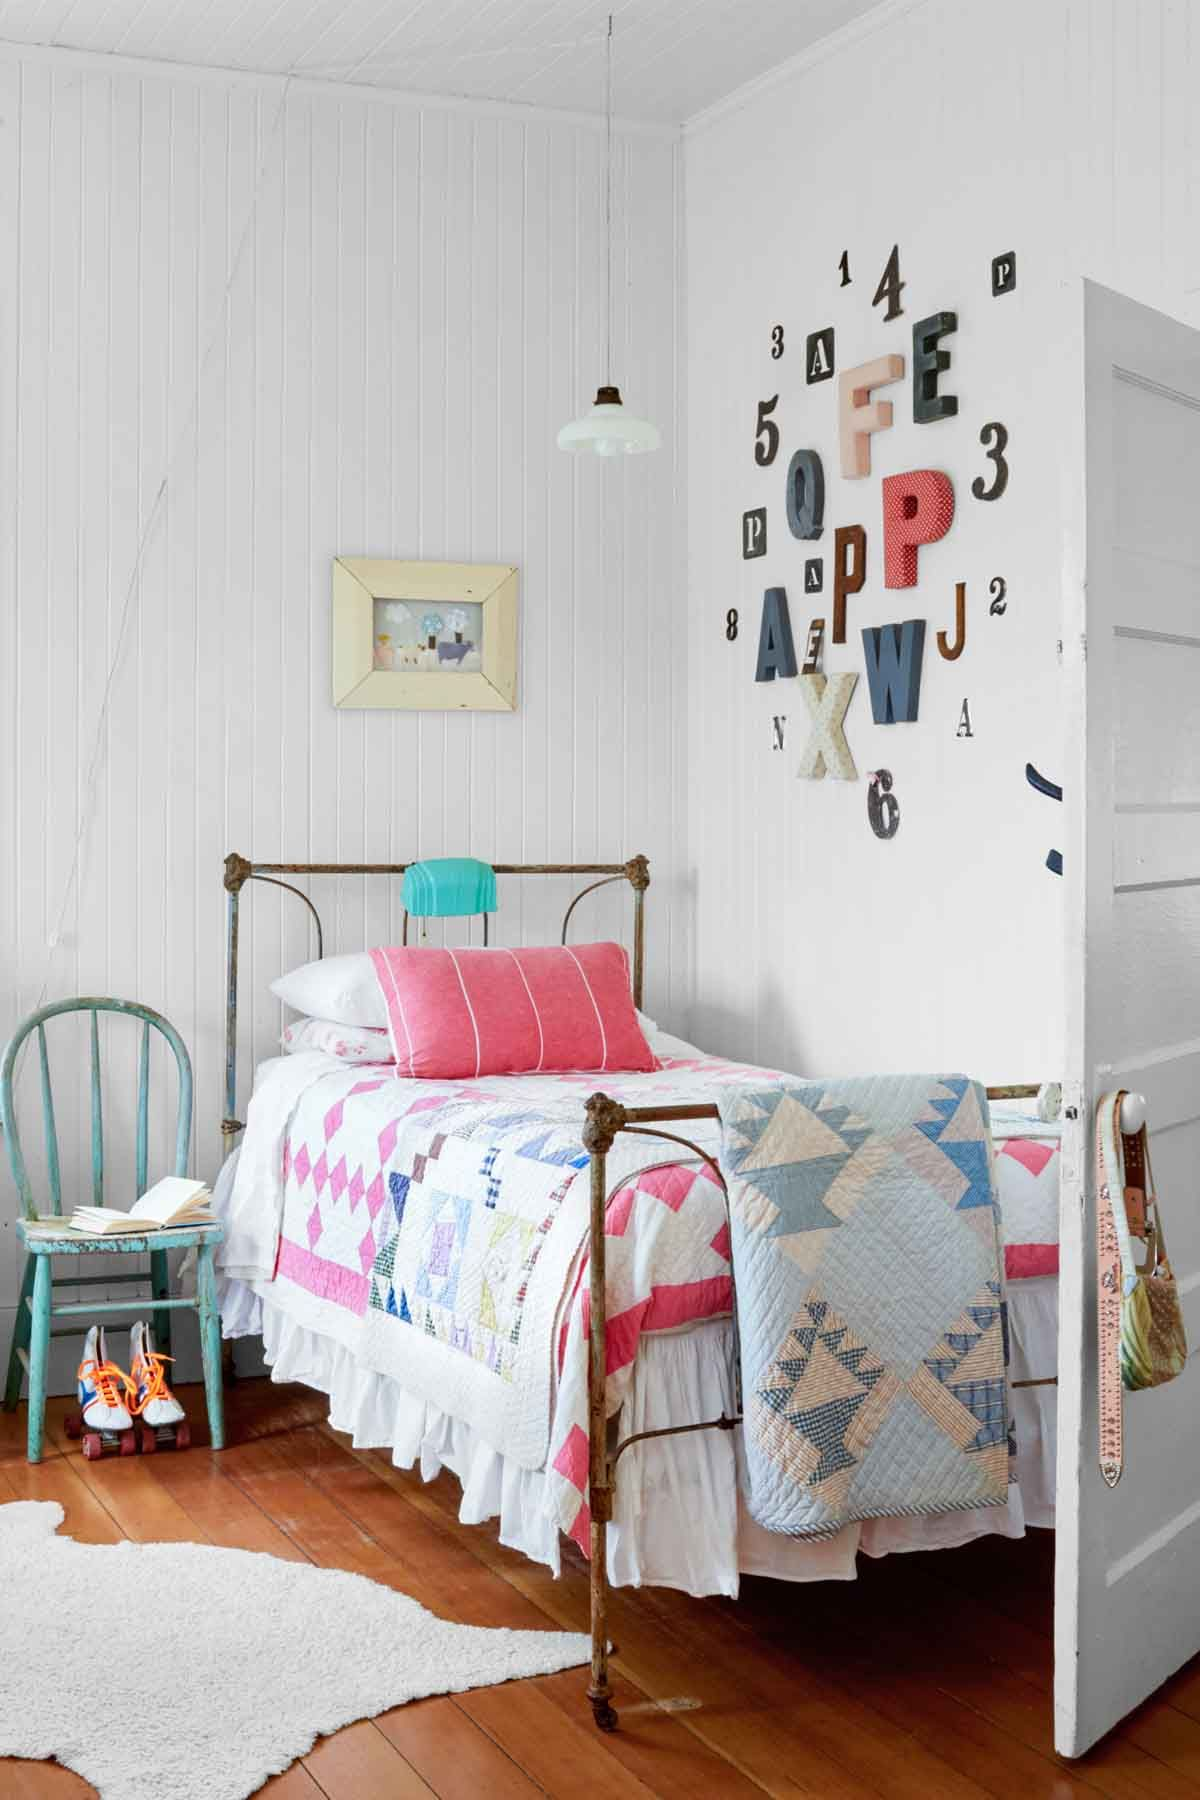 12 Fun Girl's Bedroom Decor Ideas - Cute Room Decorating ... on Girls Room Decoration  id=95046